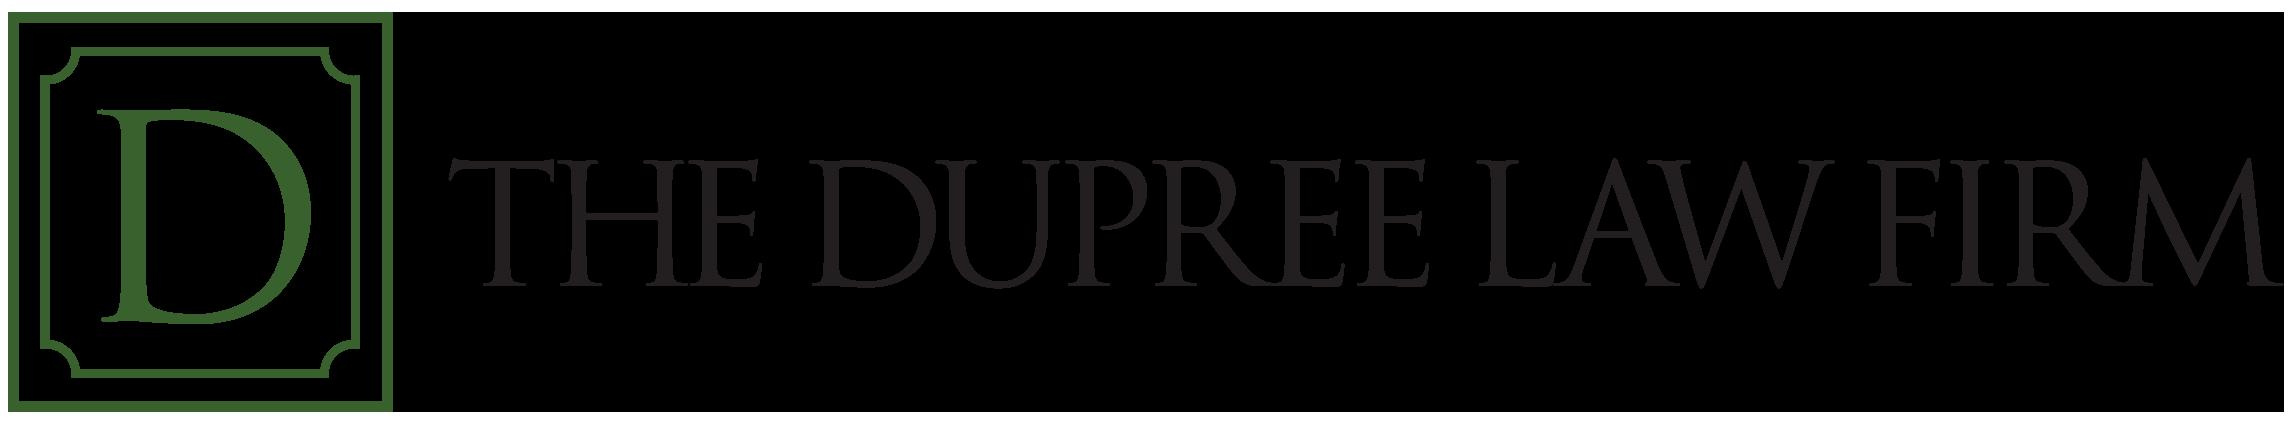 Home | Dupree Law Firm | Elizabethtown, KY